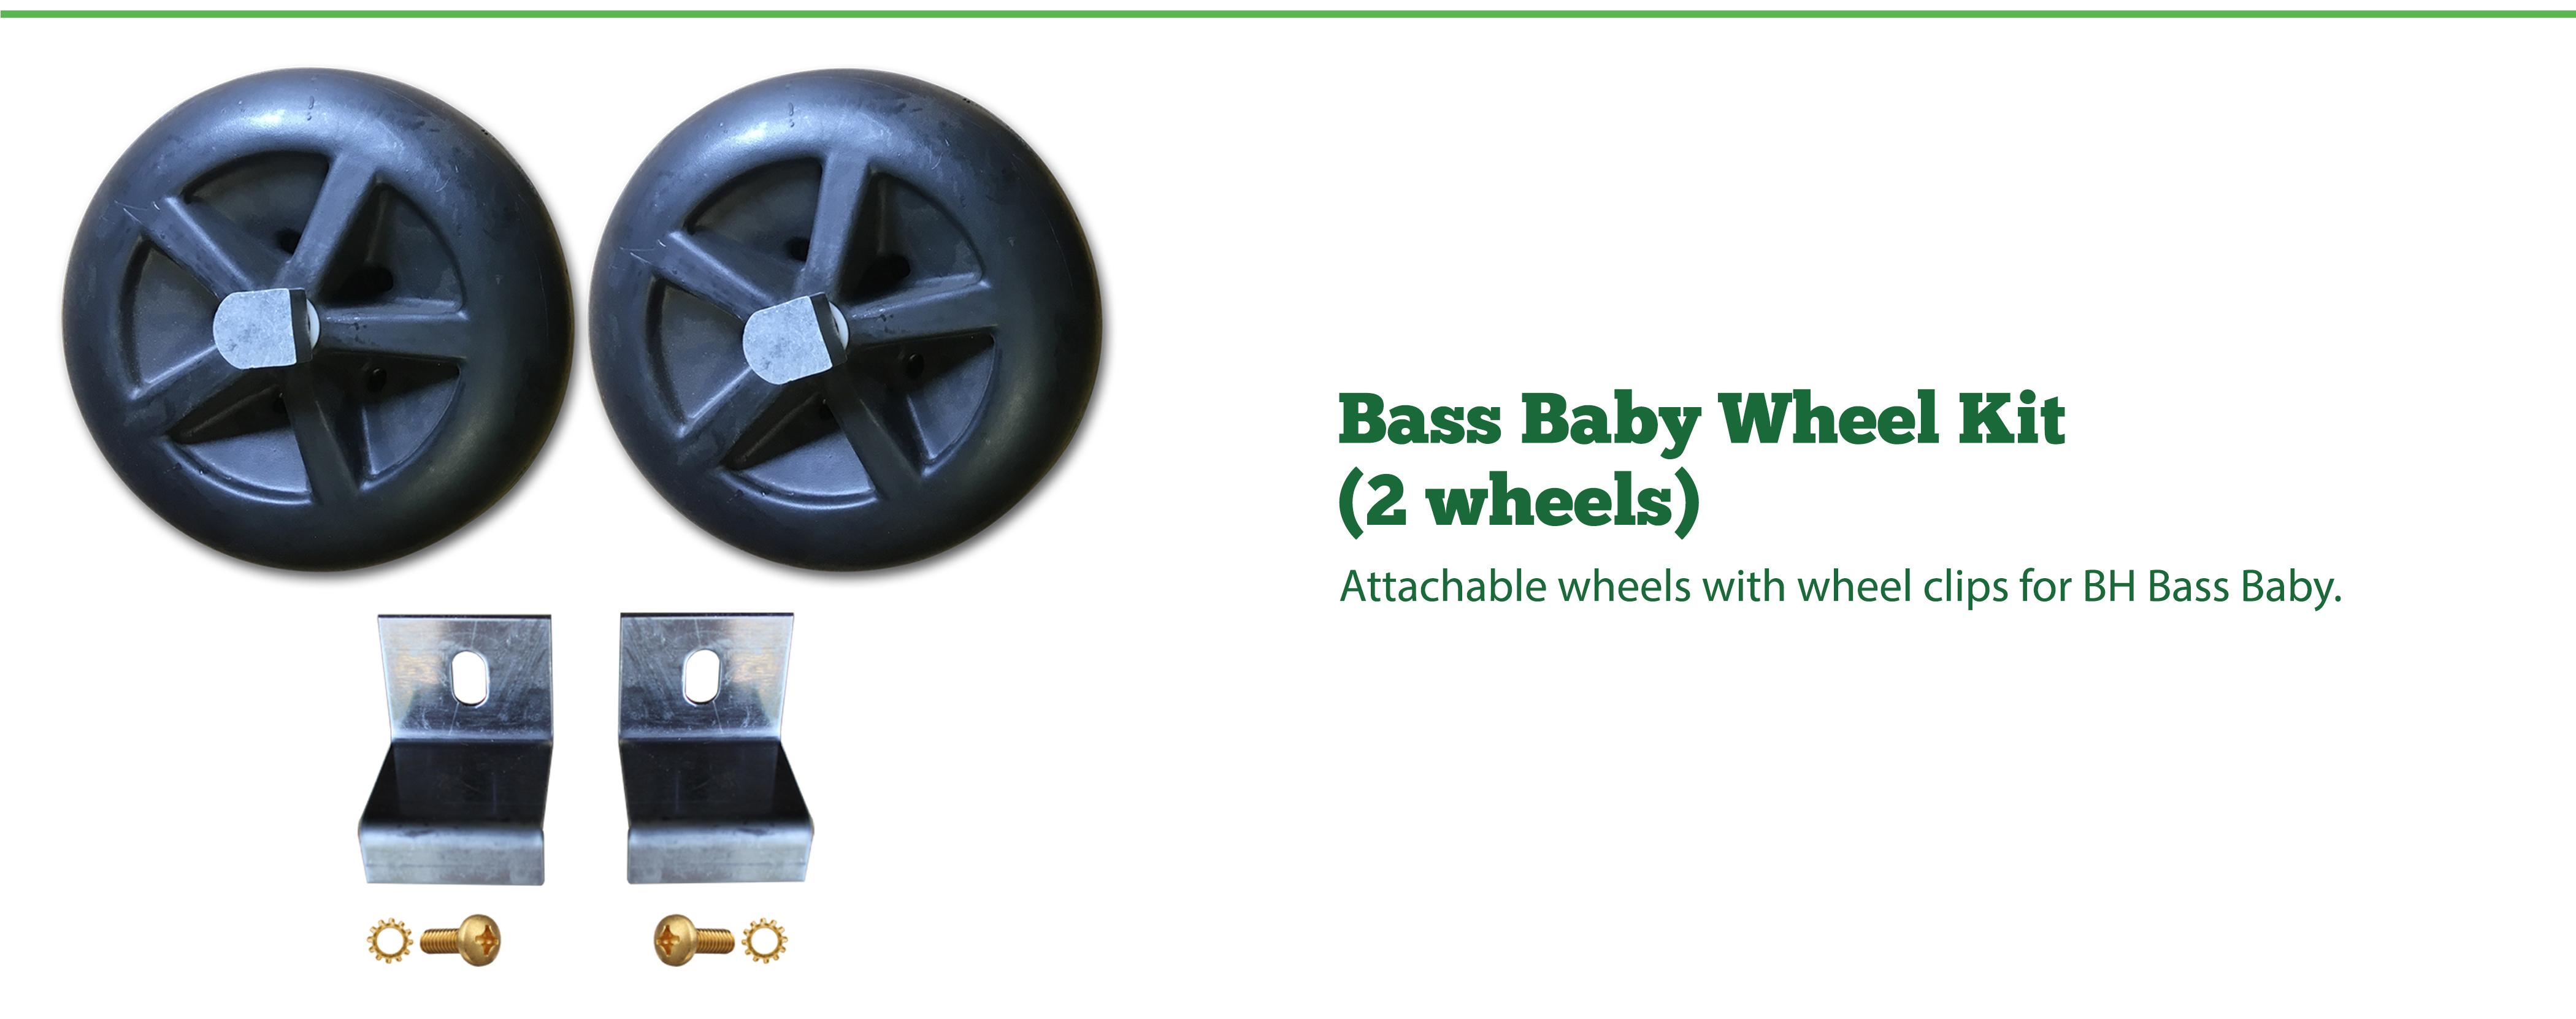 Bass Baby Wheel Kit